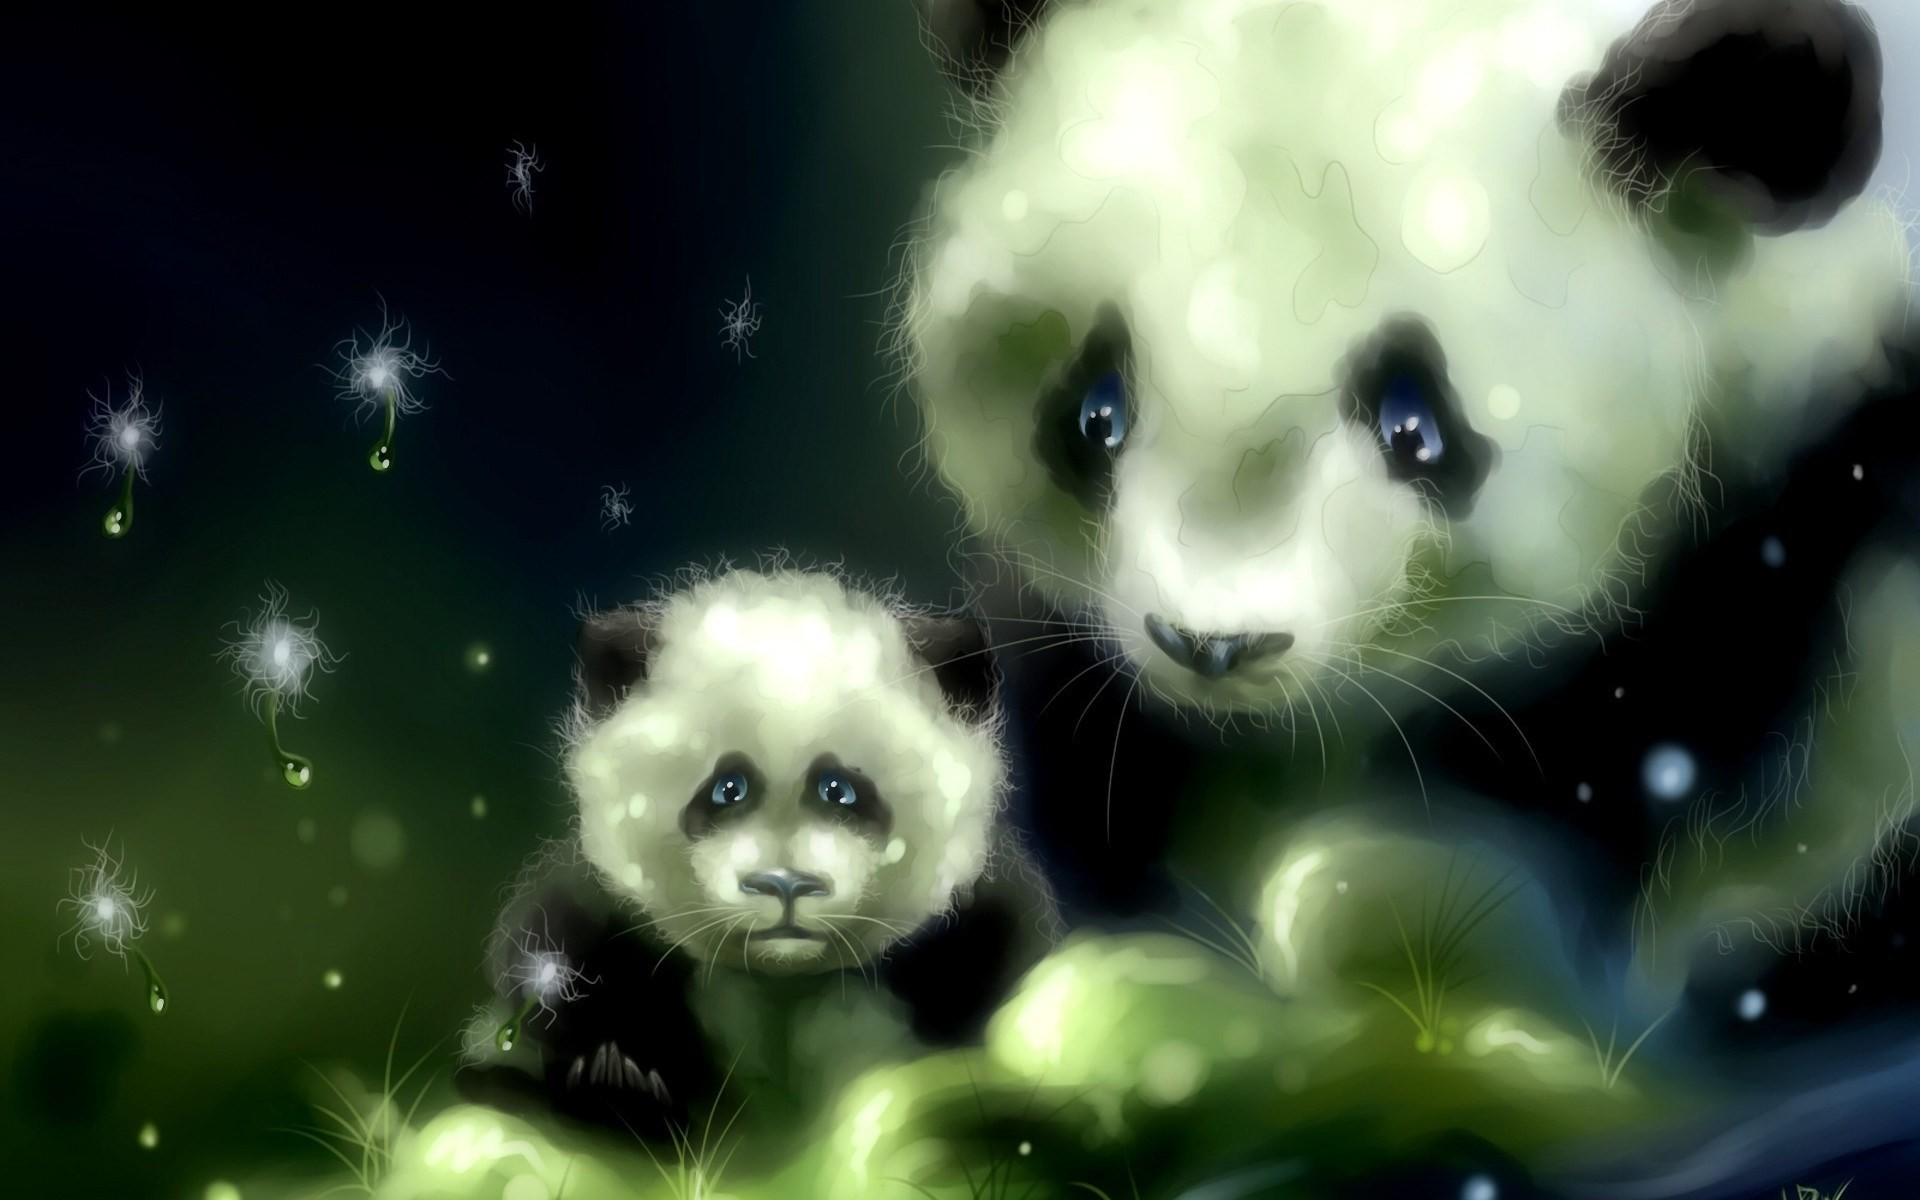 Wallpapers · cute baby panda picture desktop …